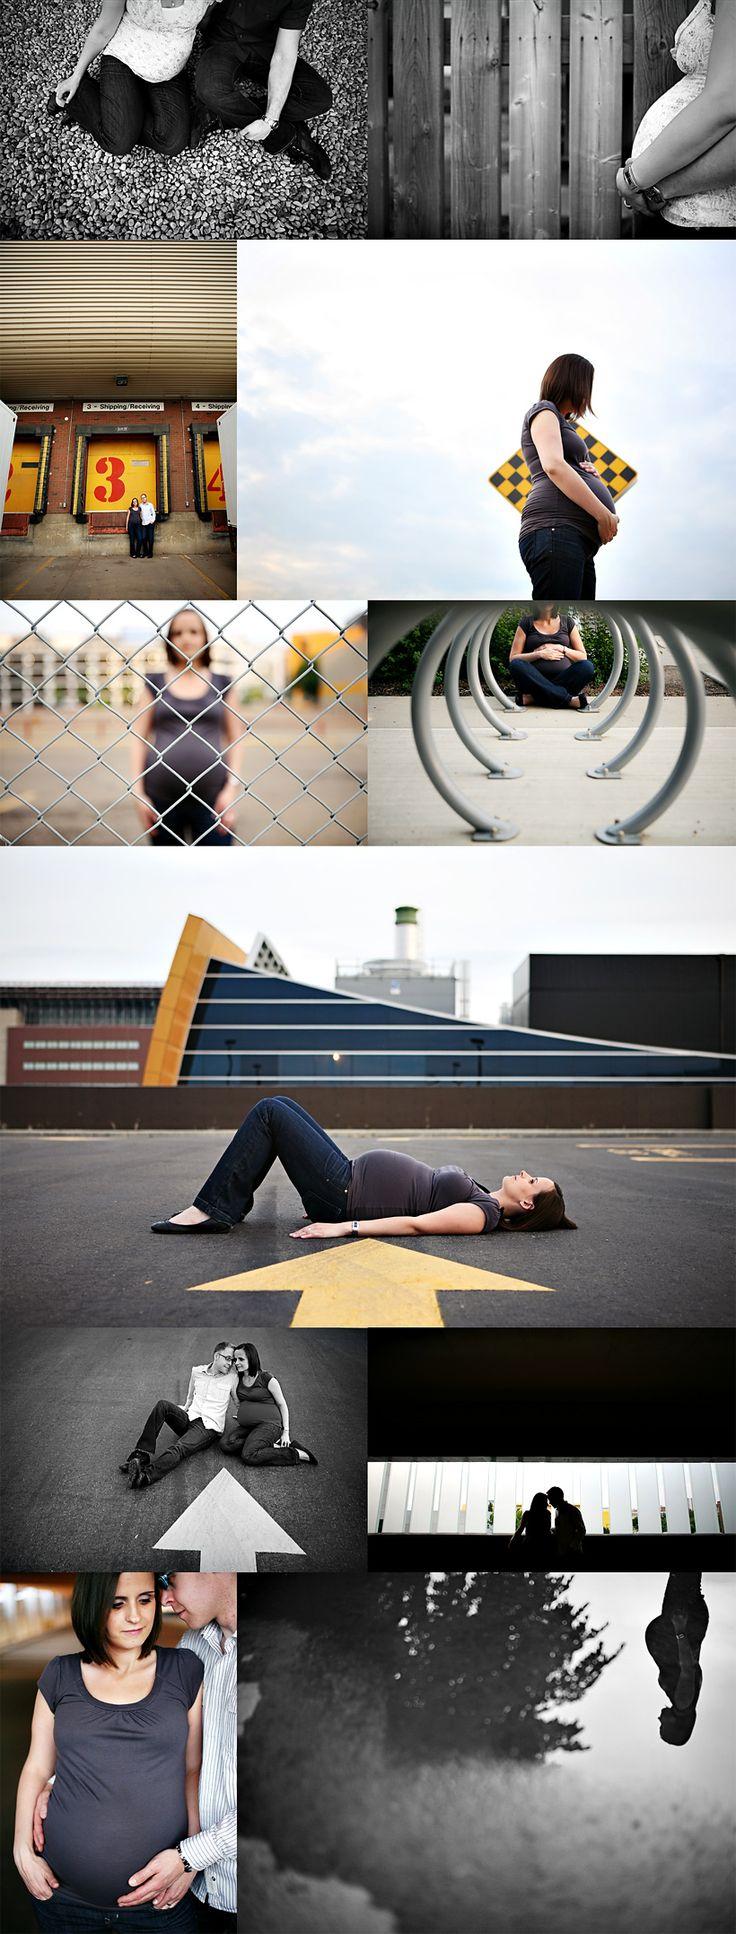 Love this gorgeous urban maternity session by Andrea Hanki...: Maternity Photo Shoot, Shoots Ideas, Maternity Photos Shoots, Pregnancy Photography, Fun Ideas, Baby, Photography Andrea, Photo Shoots